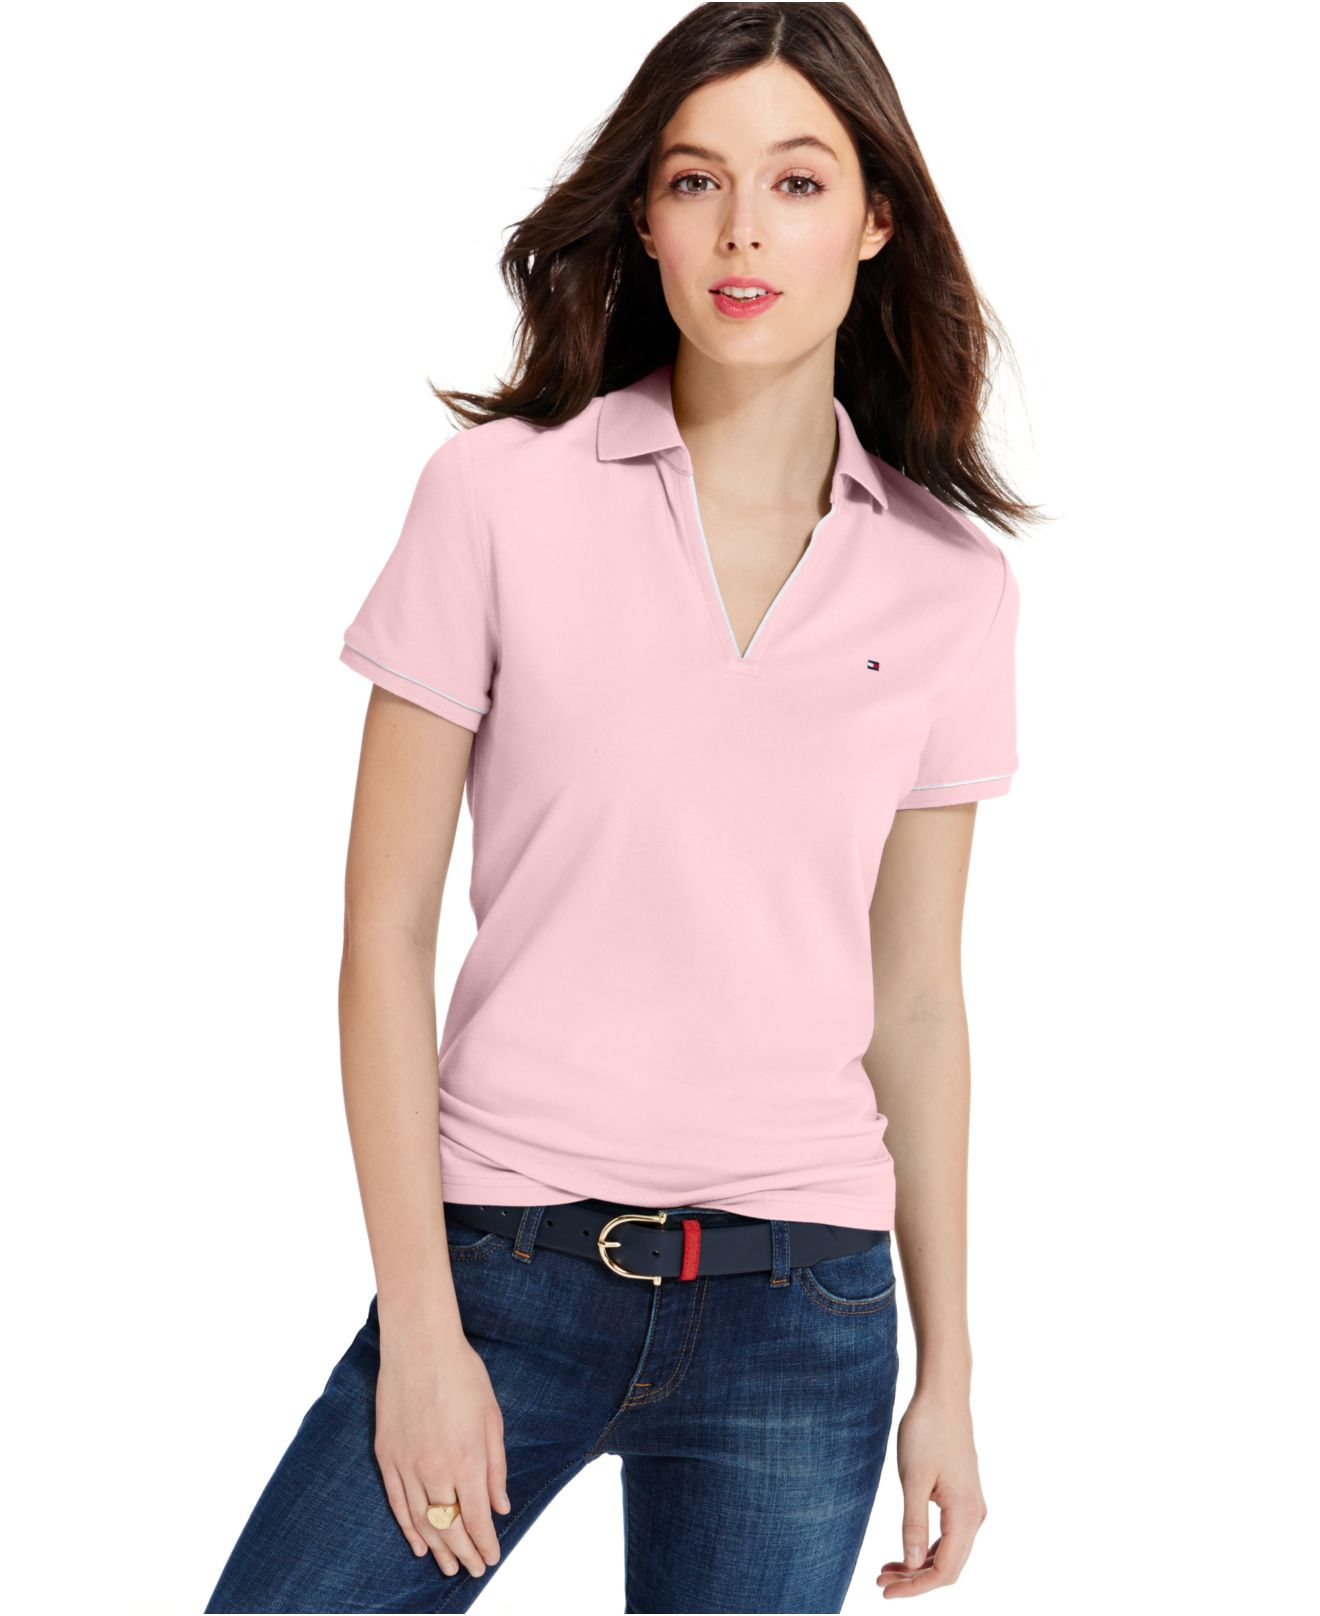 Tommy Hilfiger Womens Stripe Trim Polo Shirt, White